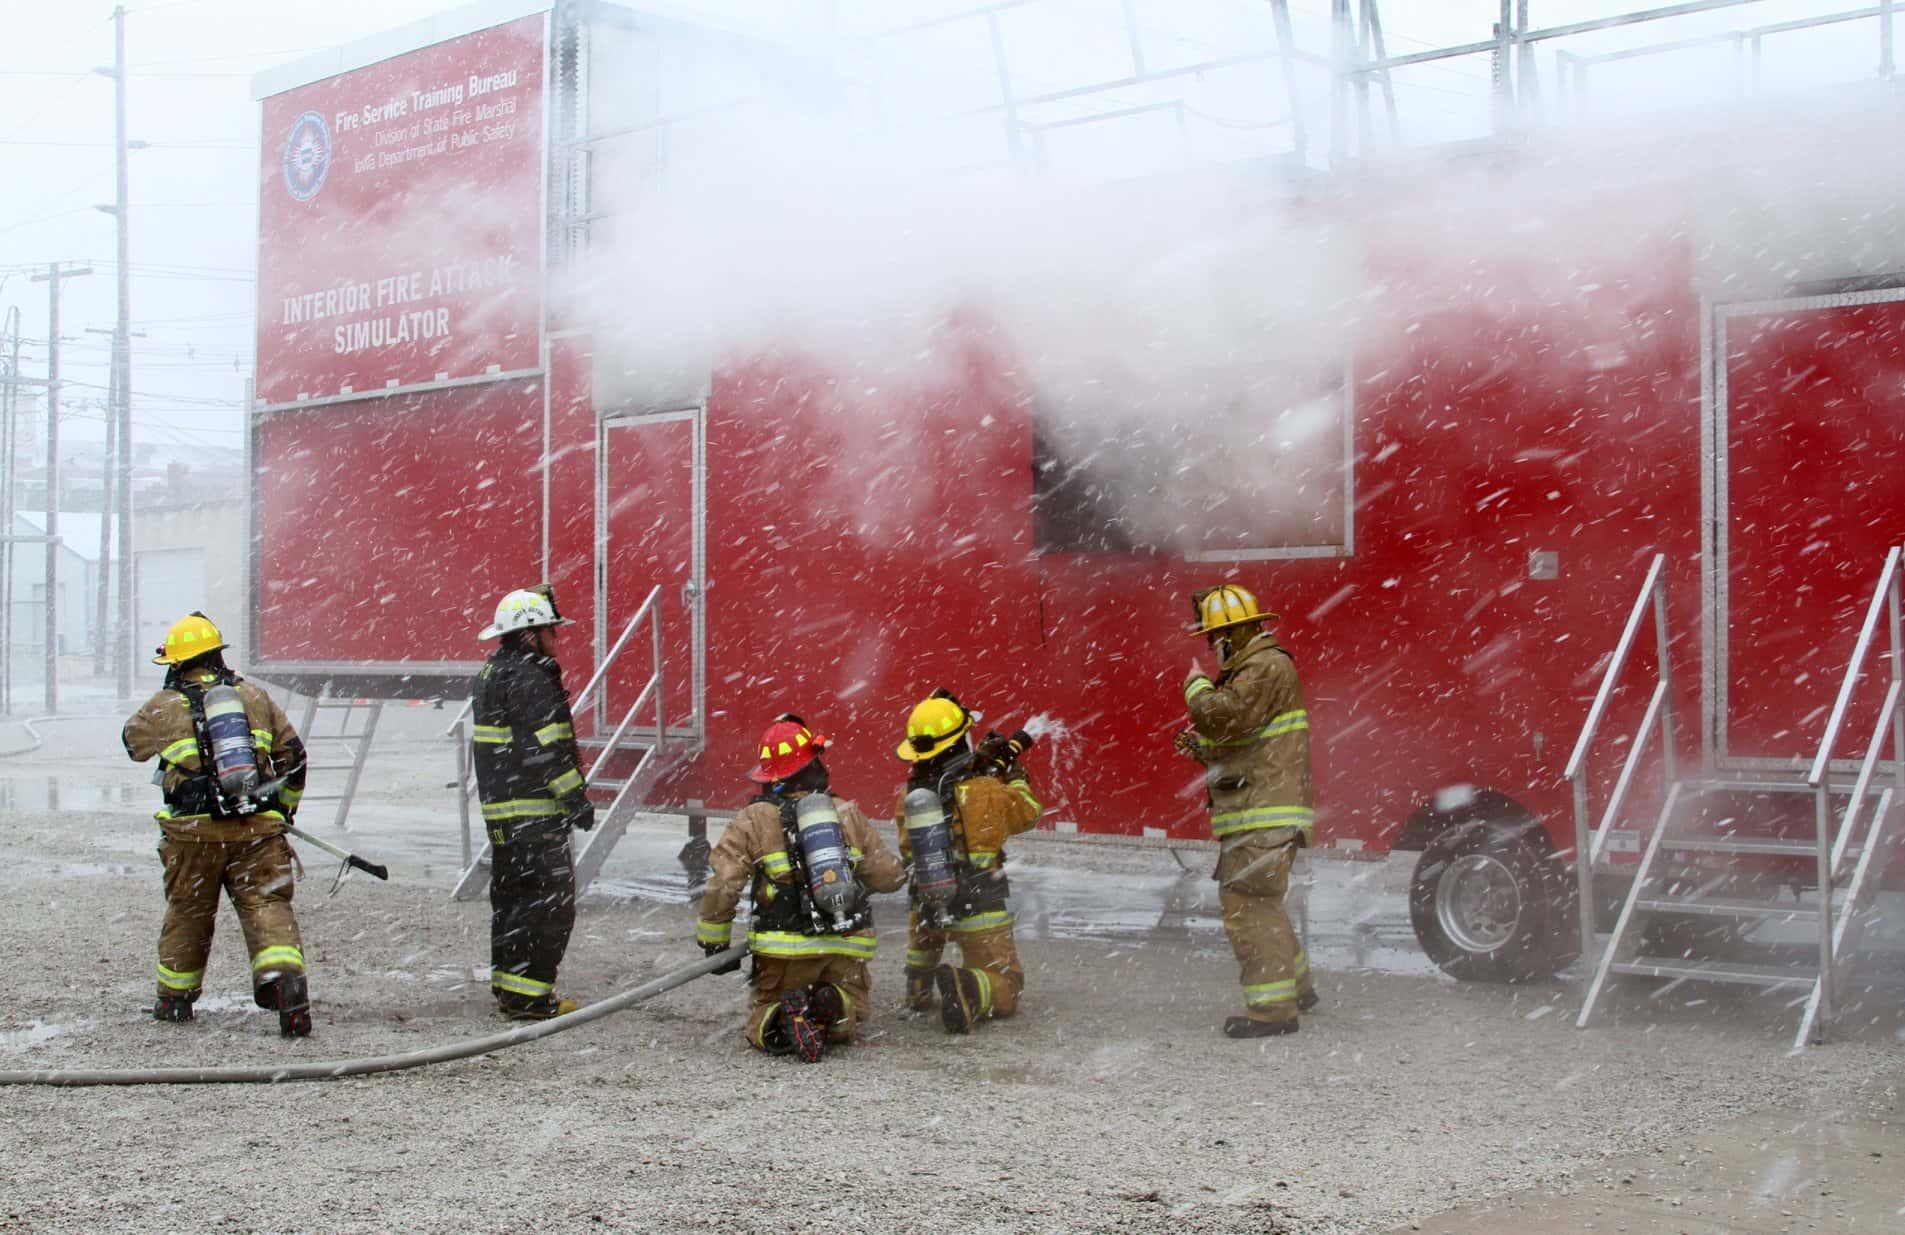 Stuart Fire Department Taking Advantage of Training